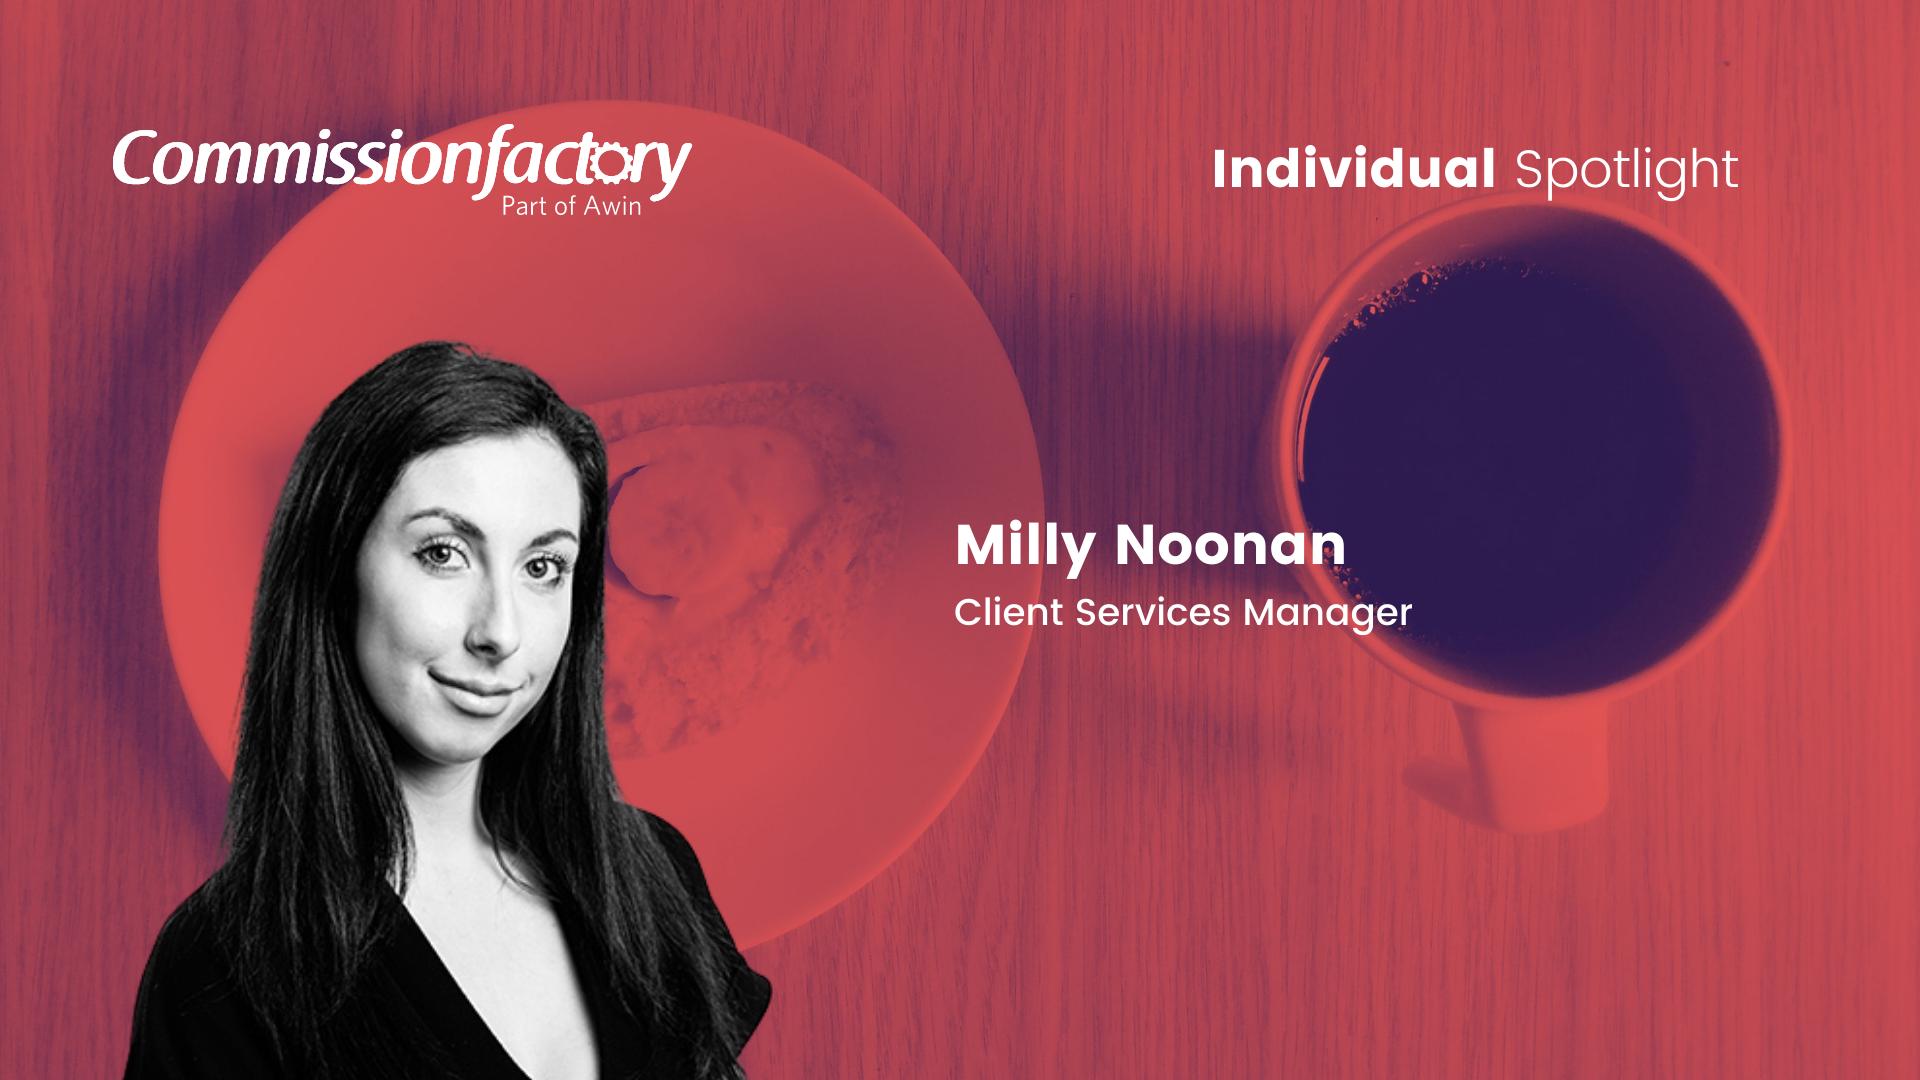 Milly Noonan Employee Spotlight